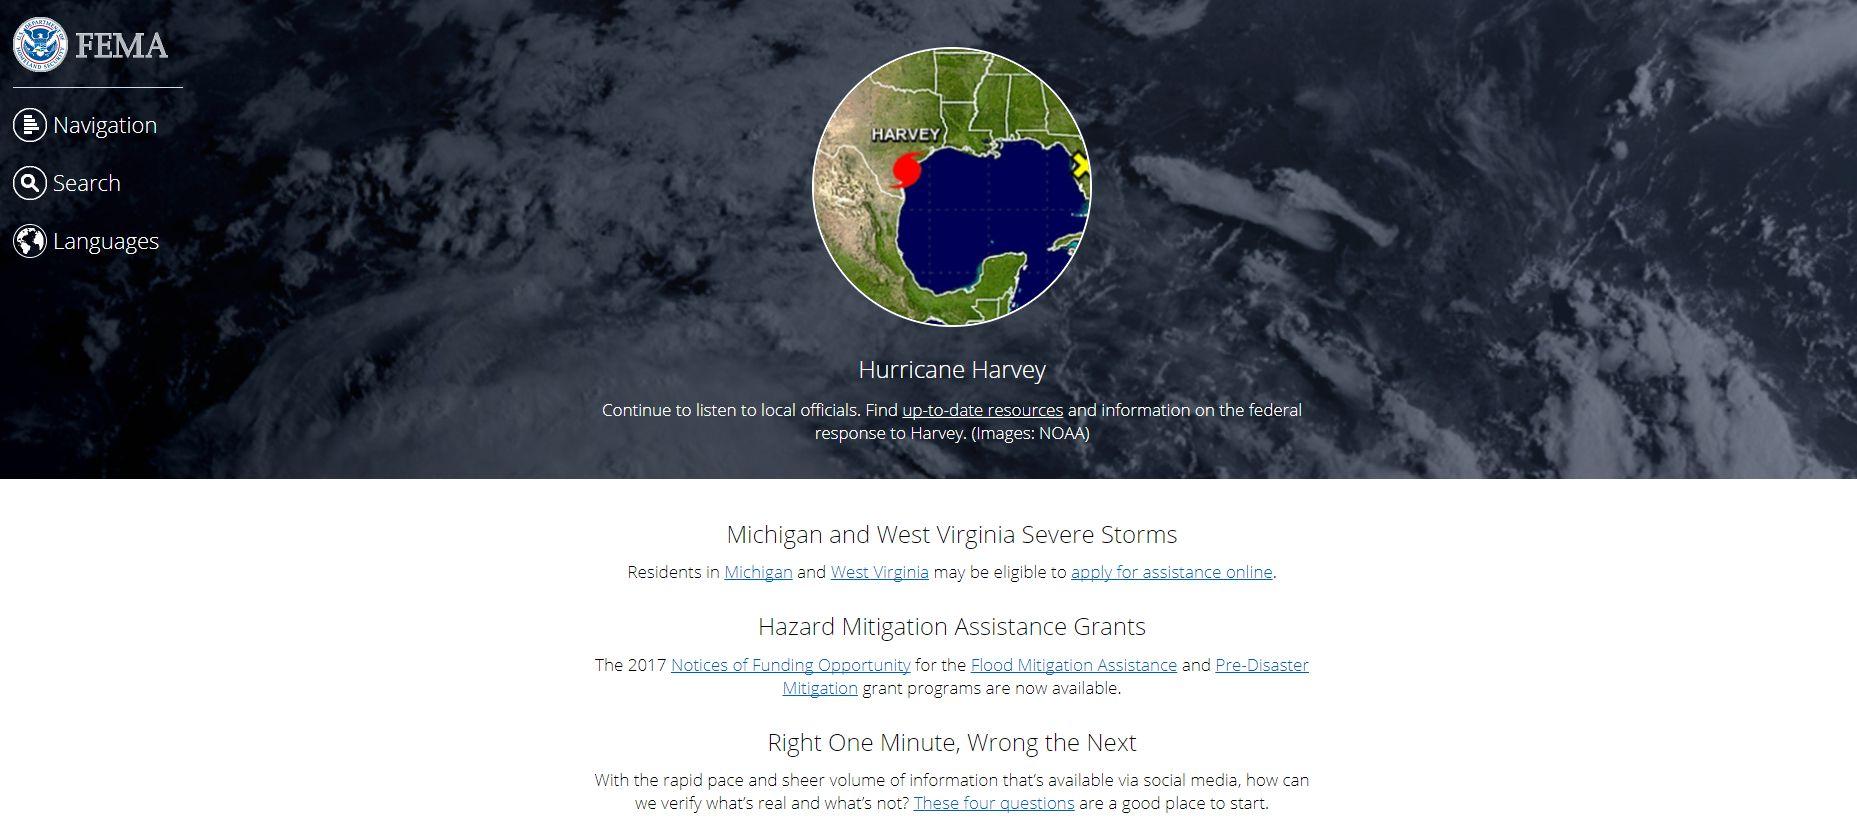 FEMA.gov's homepage during Hurricane Harvey